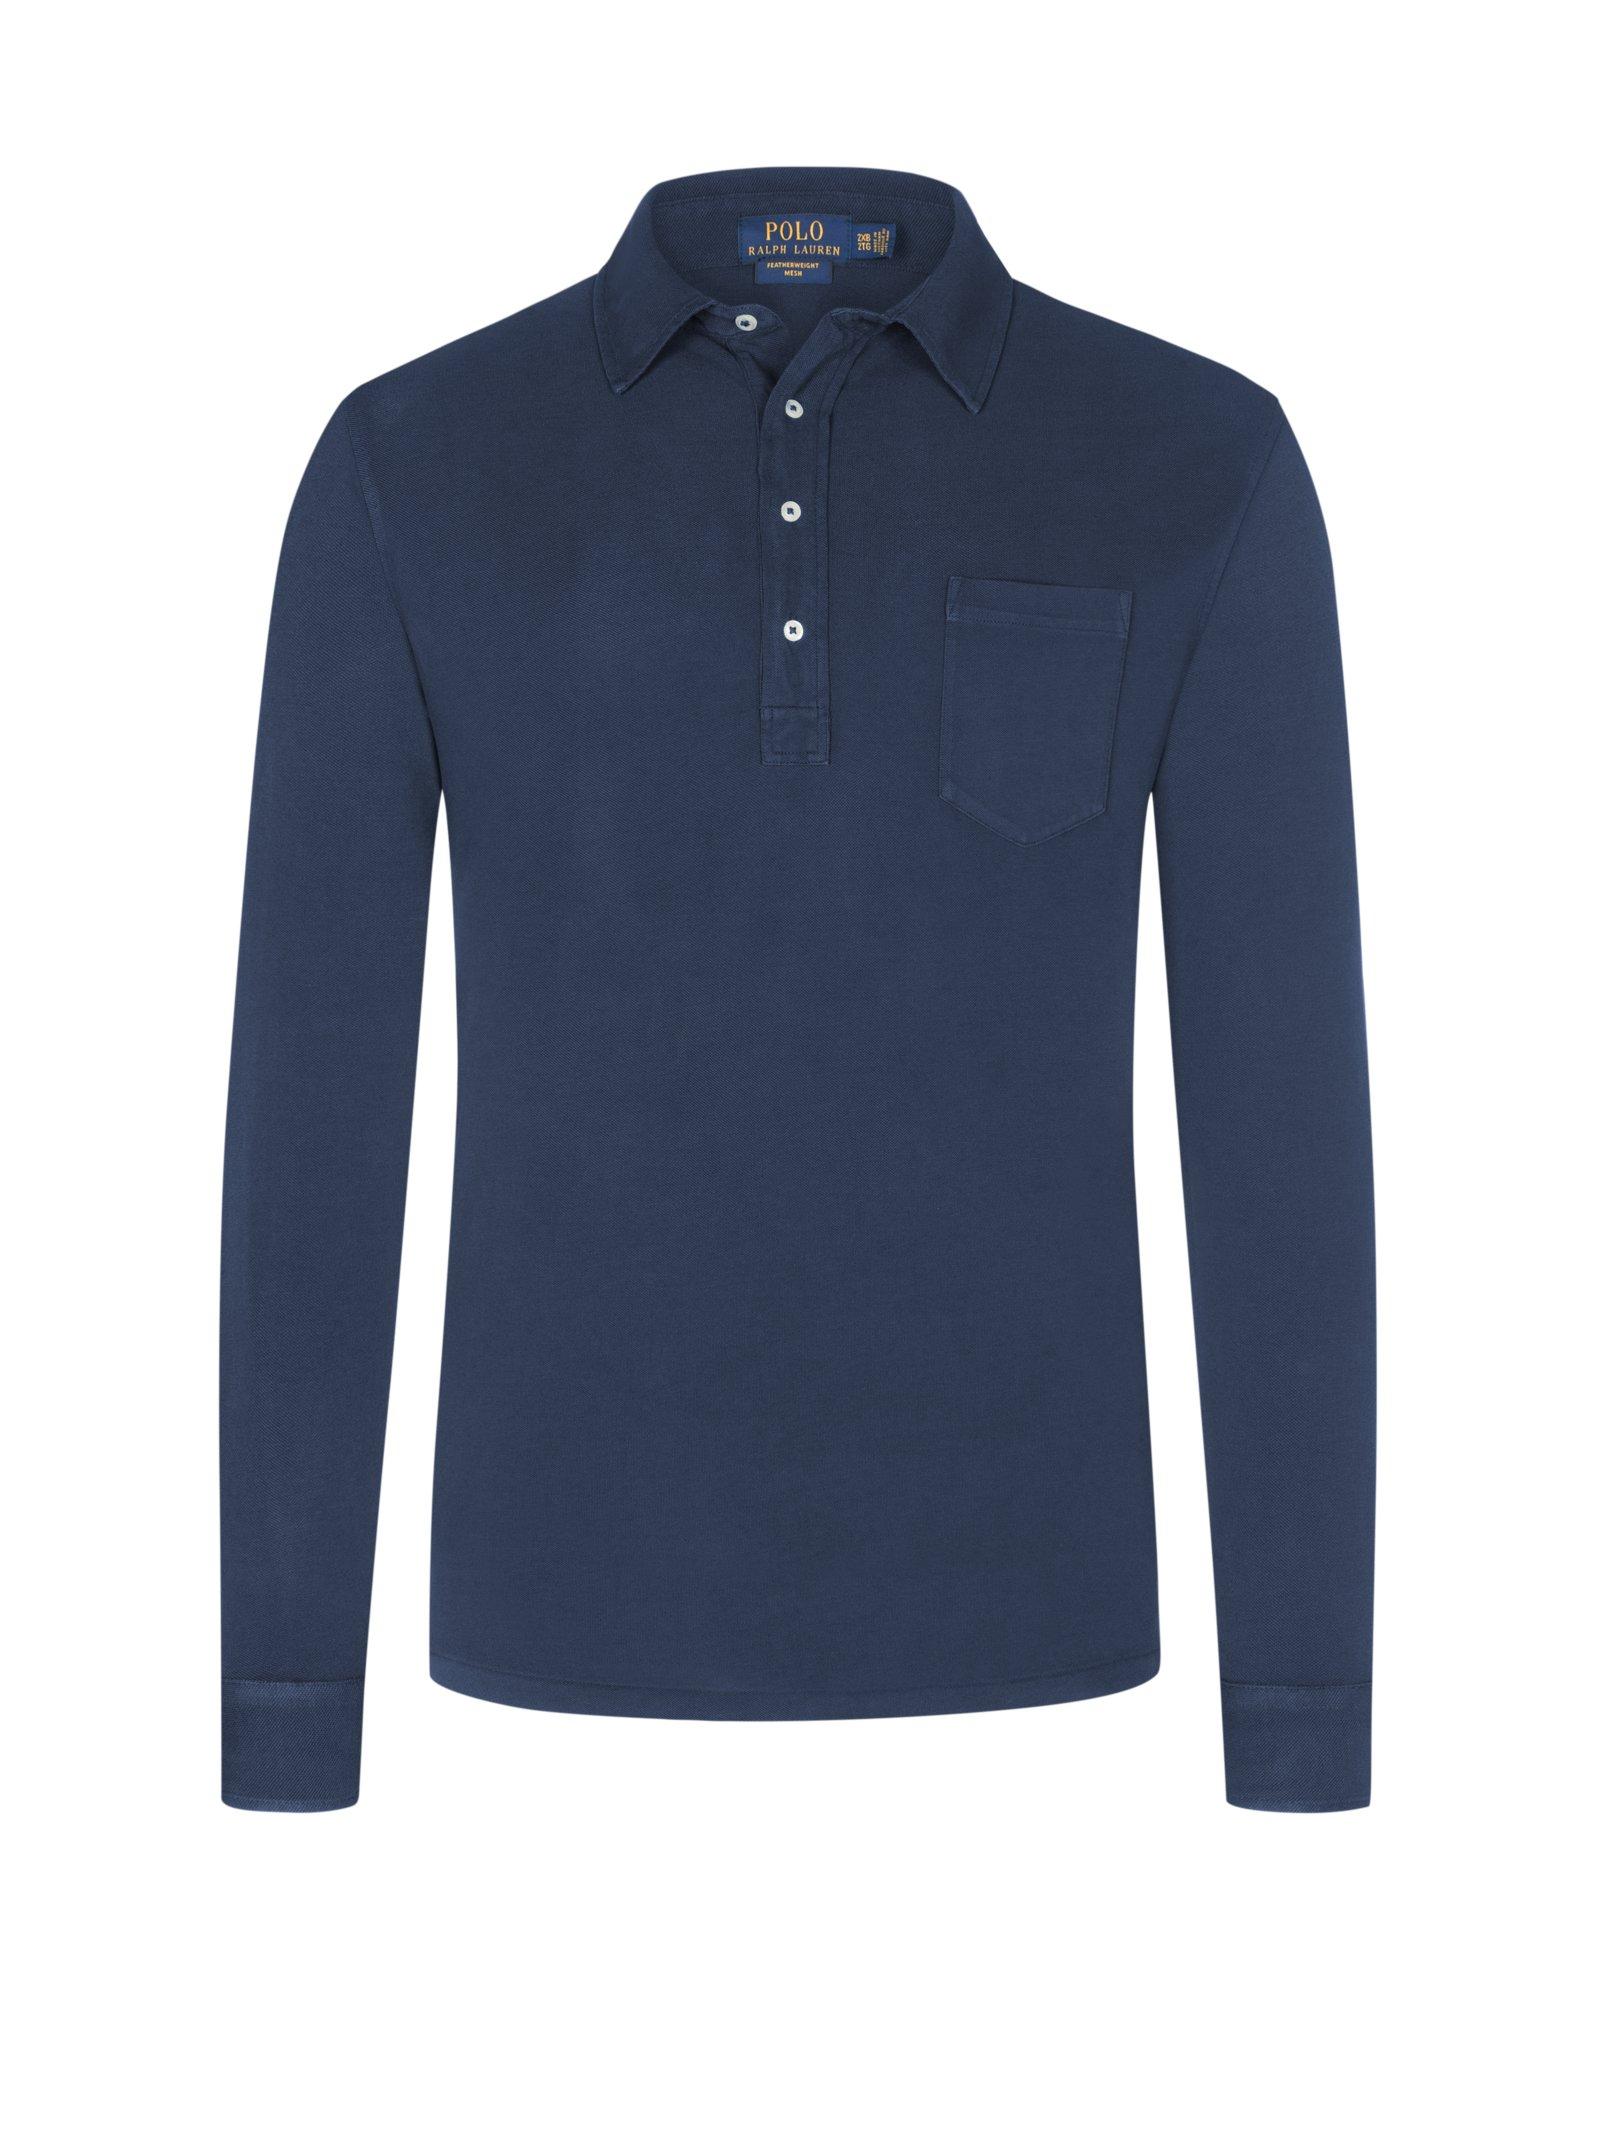 big sale e6635 5c4d7 Polo Ralph Lauren Langarm-Poloshirt mit Brusttasche marine ...